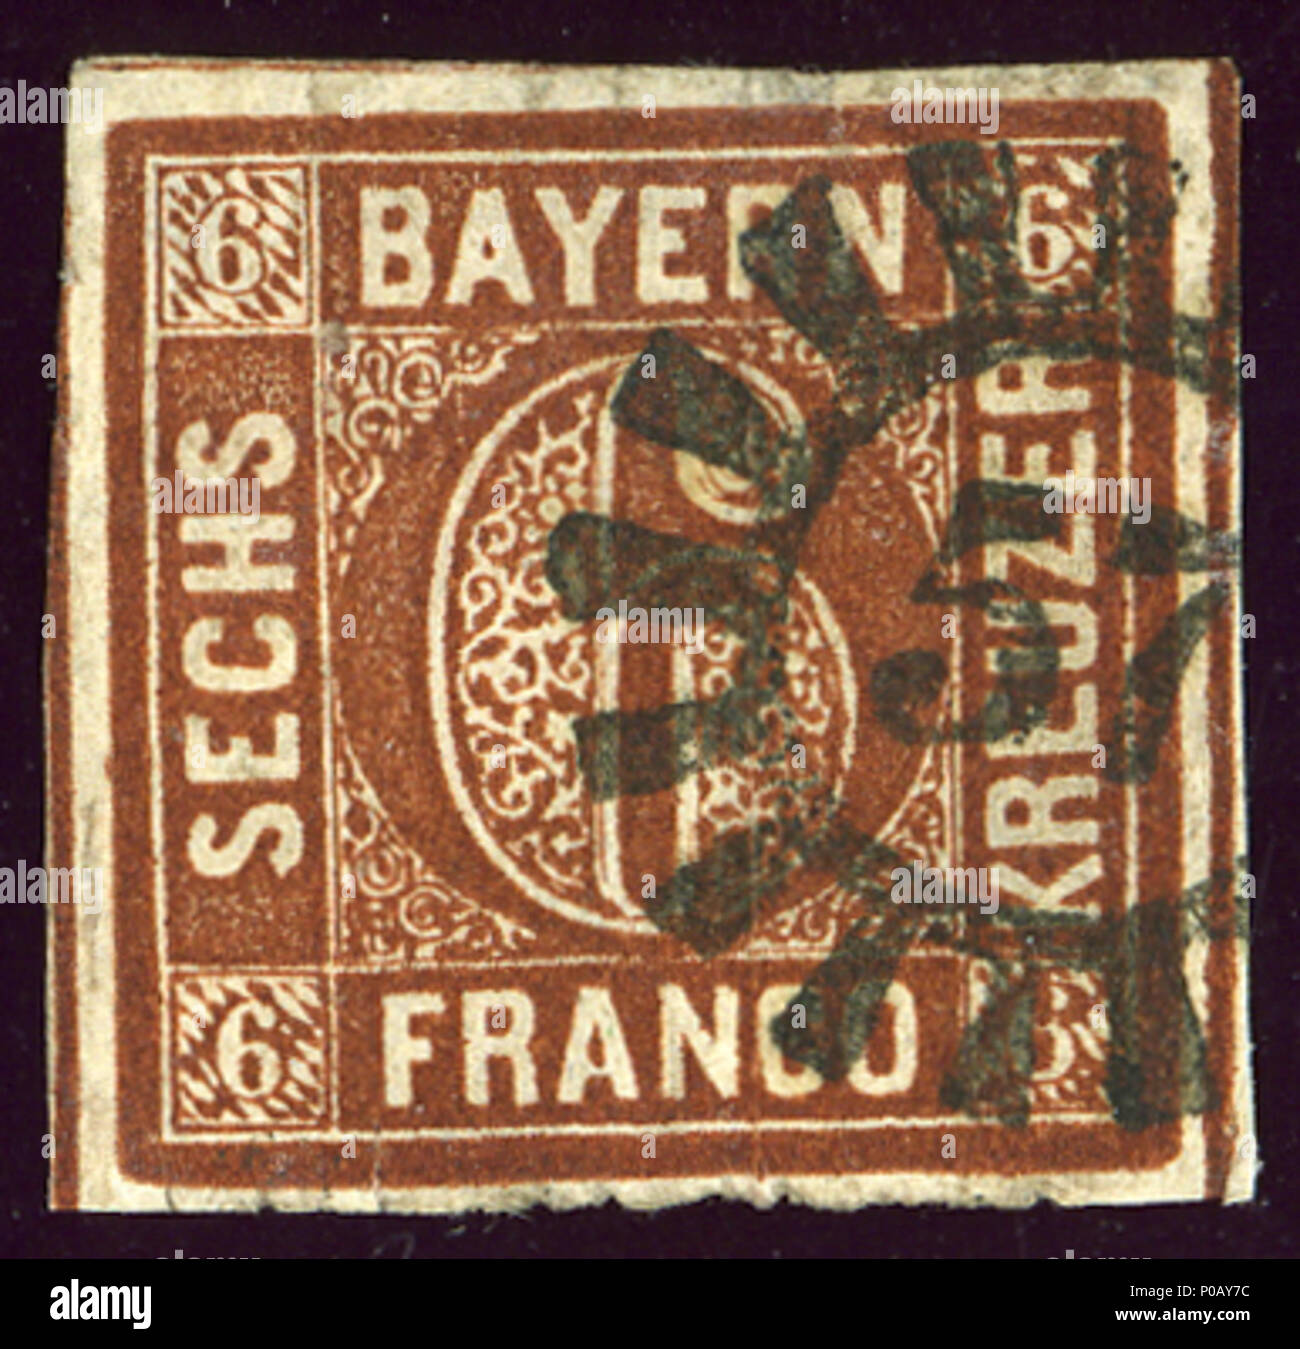 . English: Kingdom of Bavaria stamp, 6 kreuzer issue 1850, Michel 4II, closed millwheel cancelled 57 DINKELSBÜHL.  . 2 August 2013, 17:09:36. Jacquesverlaeken 20 1850 Bayern 6kr Mi4II 57 File0151 - Stock Image